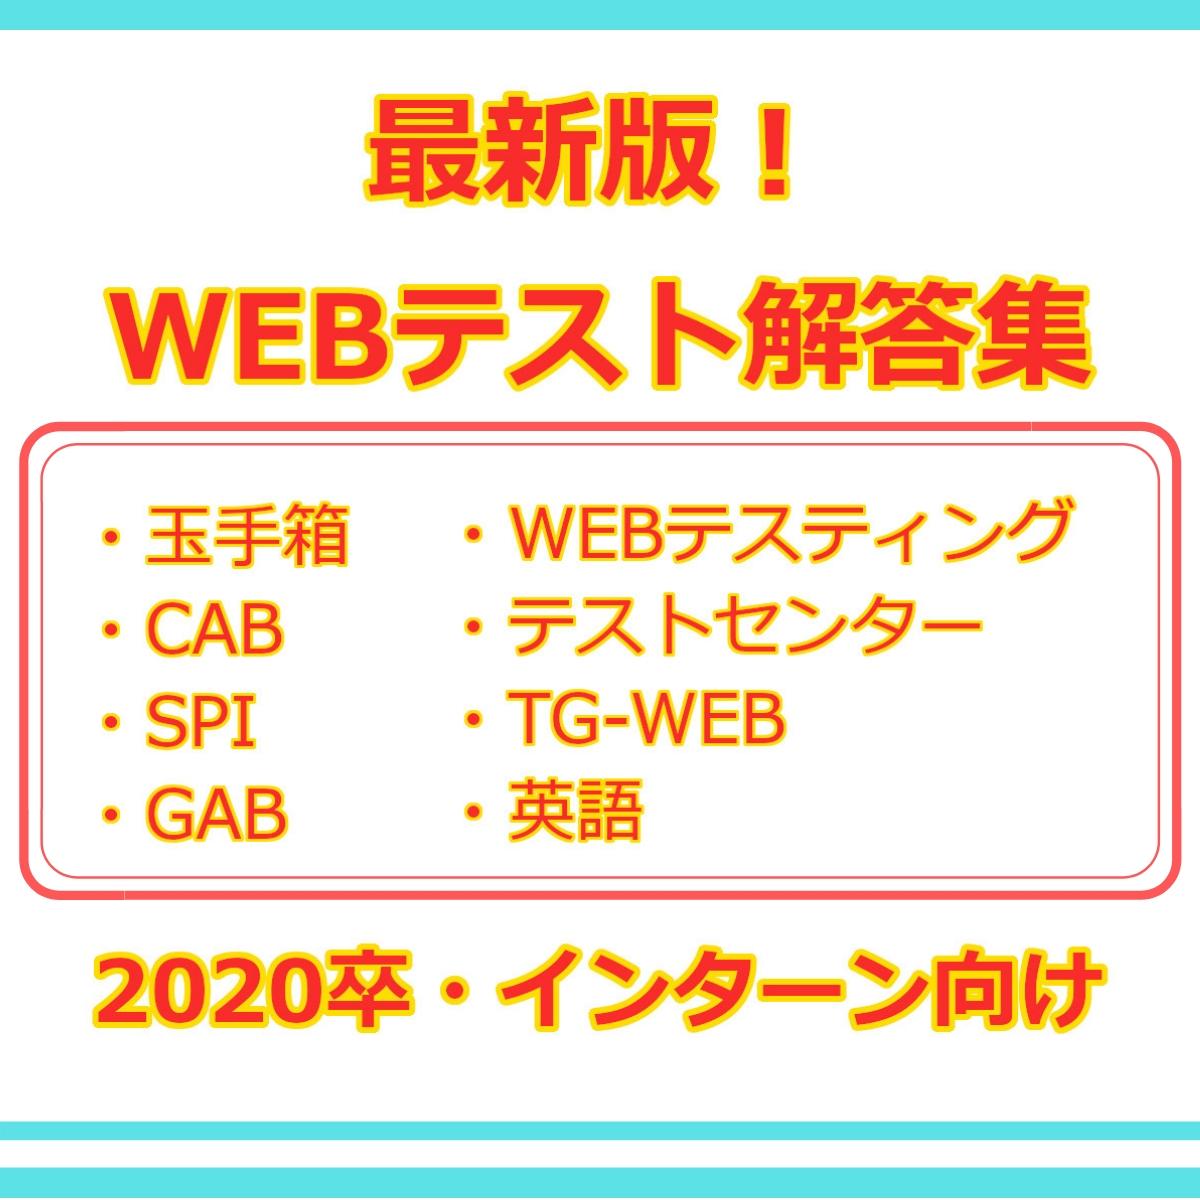 Web テスト インターン